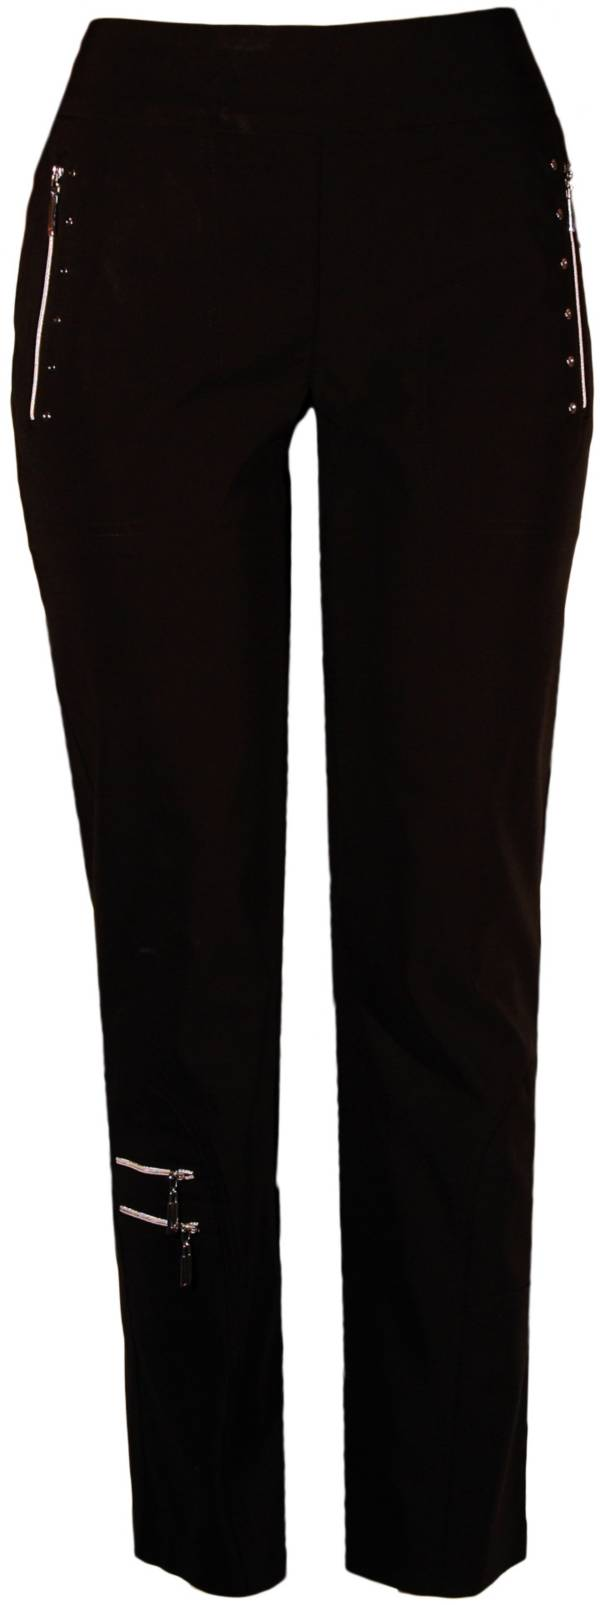 Jamie Sadock Women's Skinnyliscious Zipper Ankle Pants product image